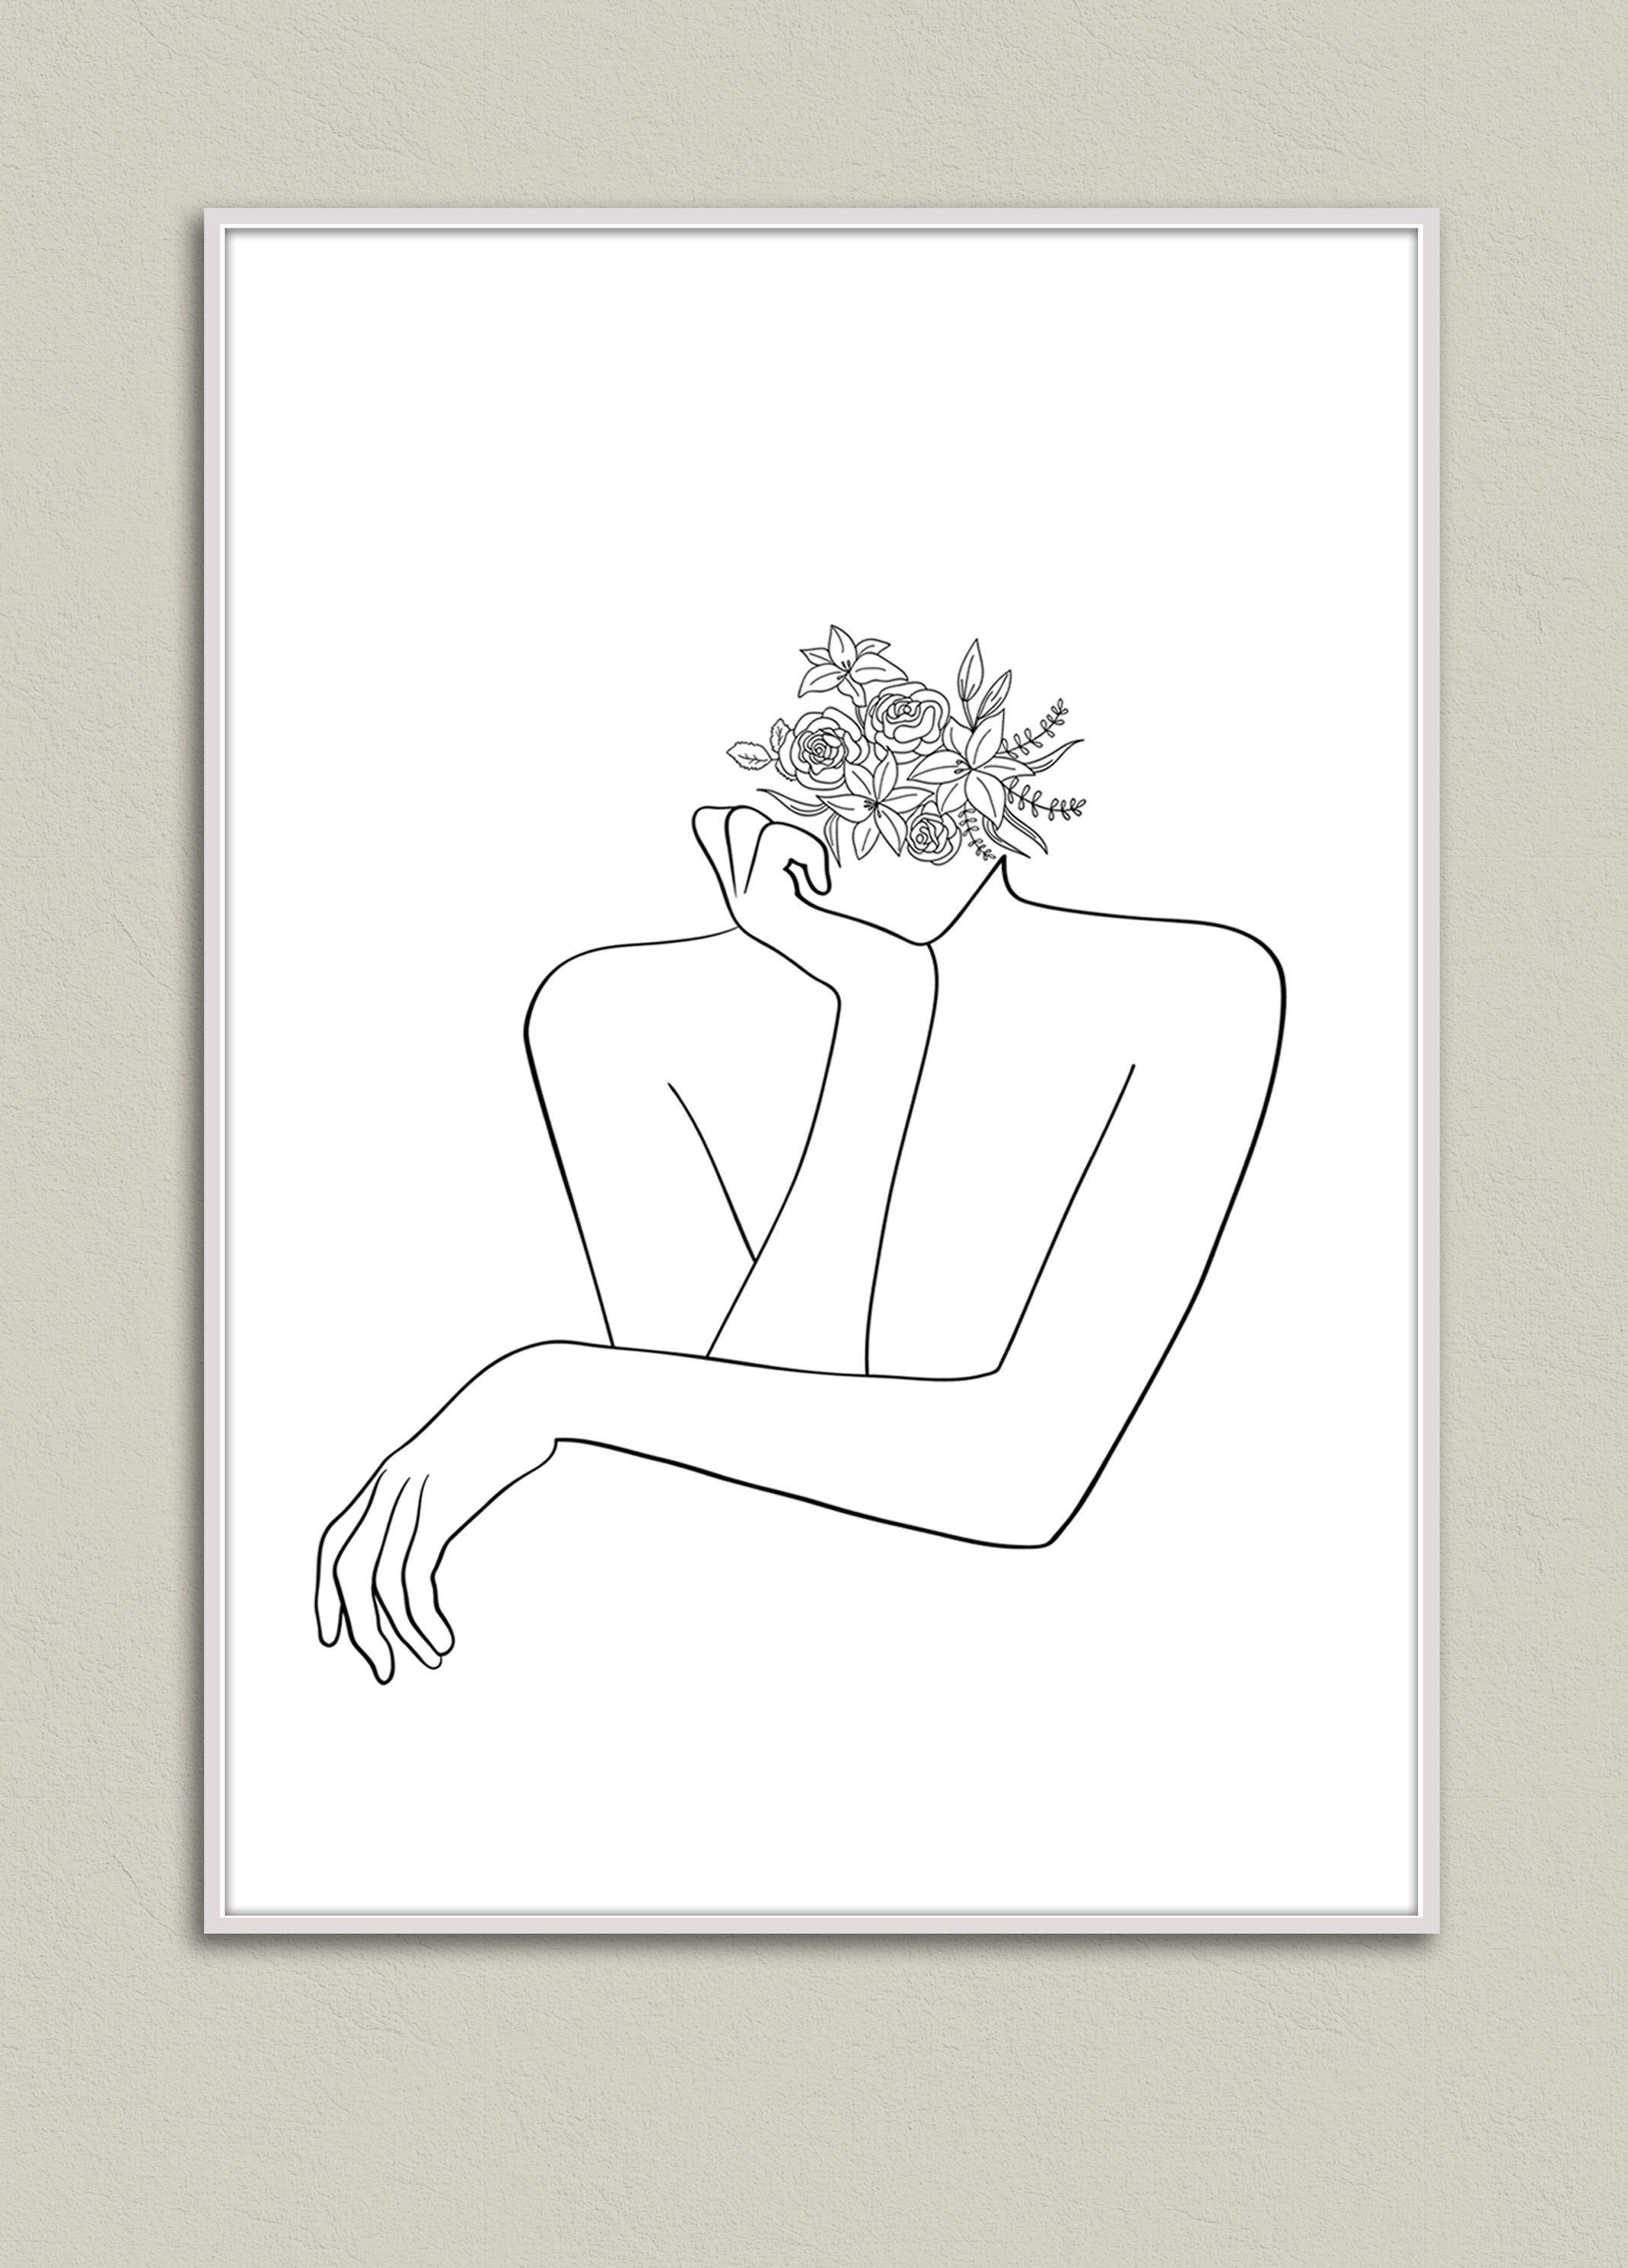 Head Of Flowers Art Woman Outline Drawing Woman With Etsy Outline Drawings Face Outline Outline Art